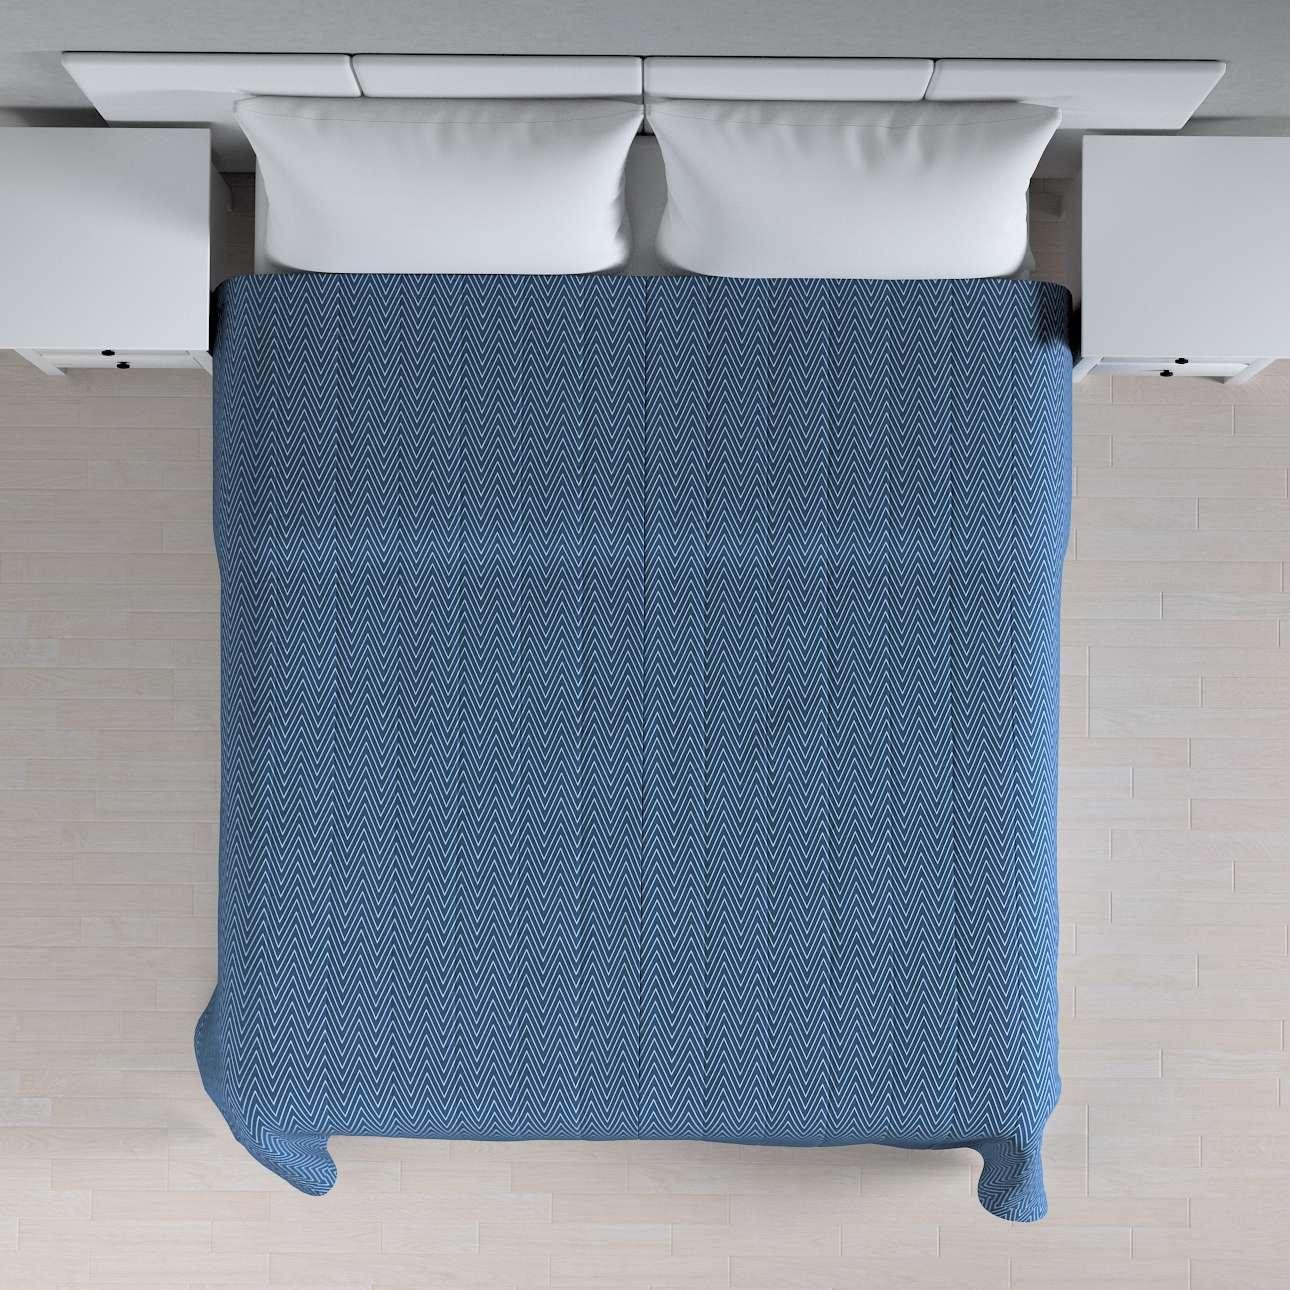 Sengetæppe quiltet<br/>10cm striber 120g/m 260 x 210 cm fra kollektionen Brooklyn, Stof: 137-88